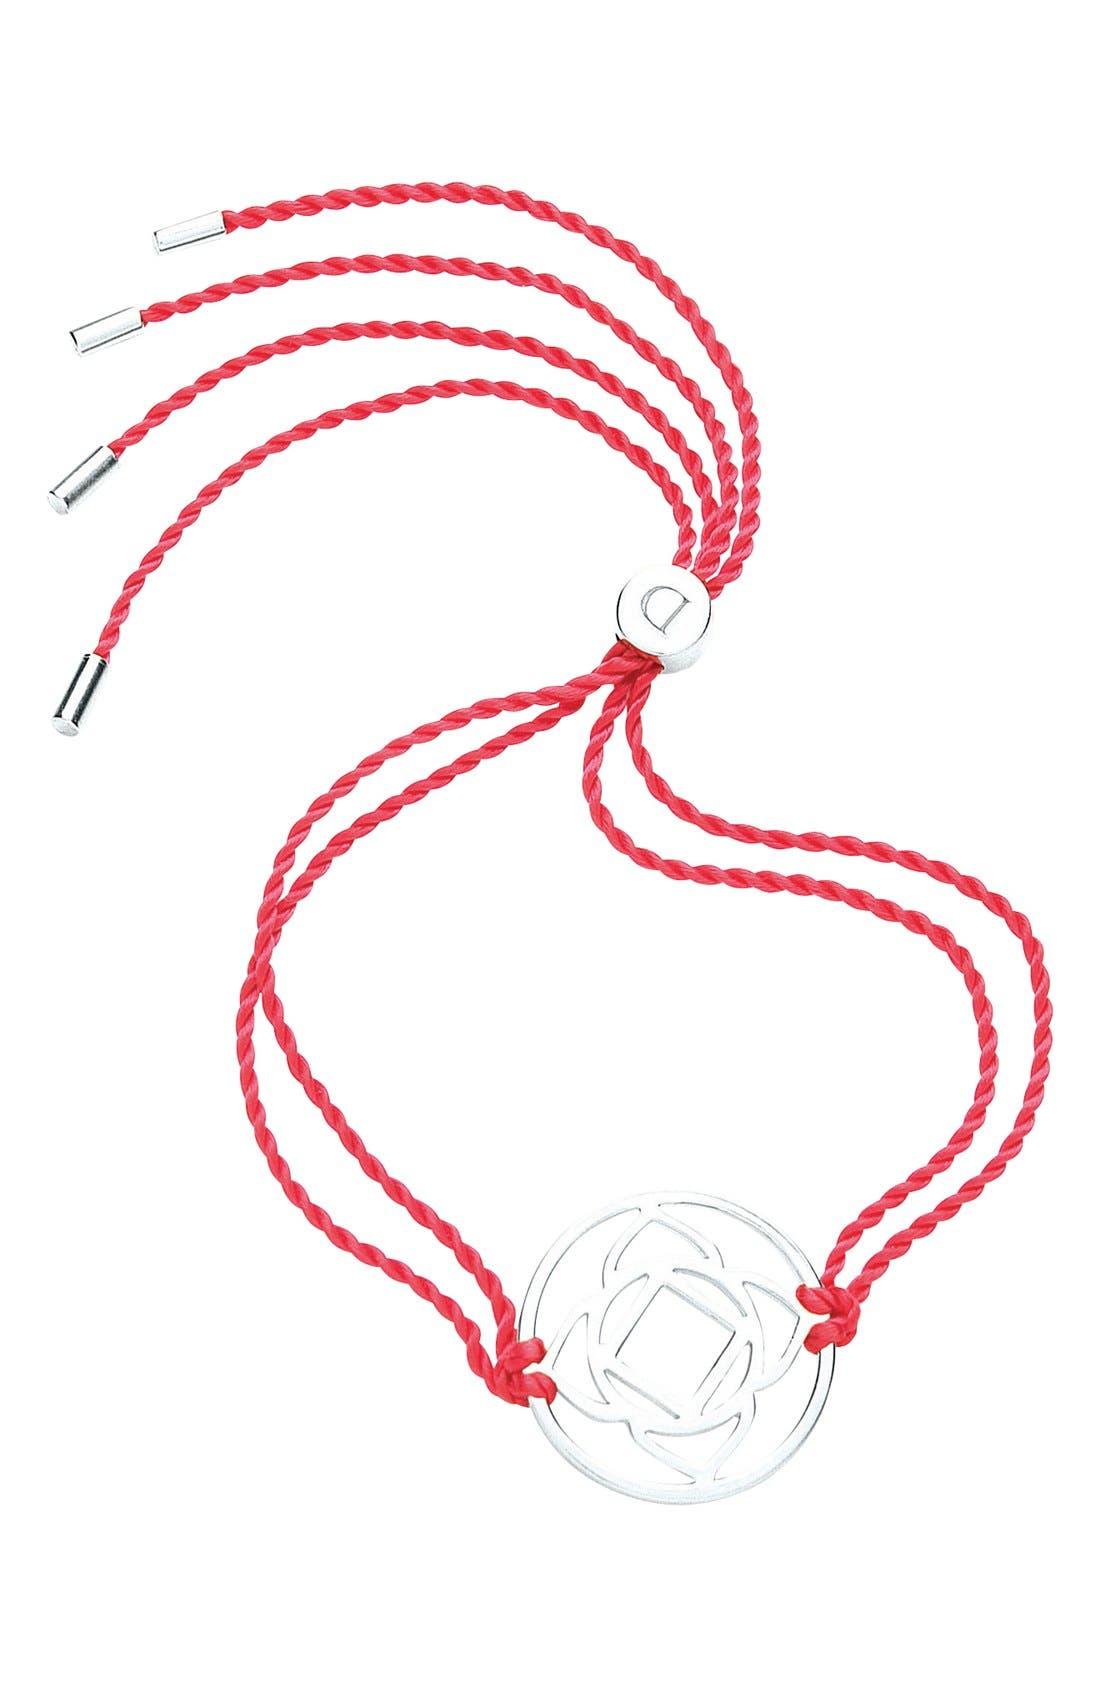 Alternate Image 1 Selected - Daisy London 'Base Chakra' Cord Bracelet